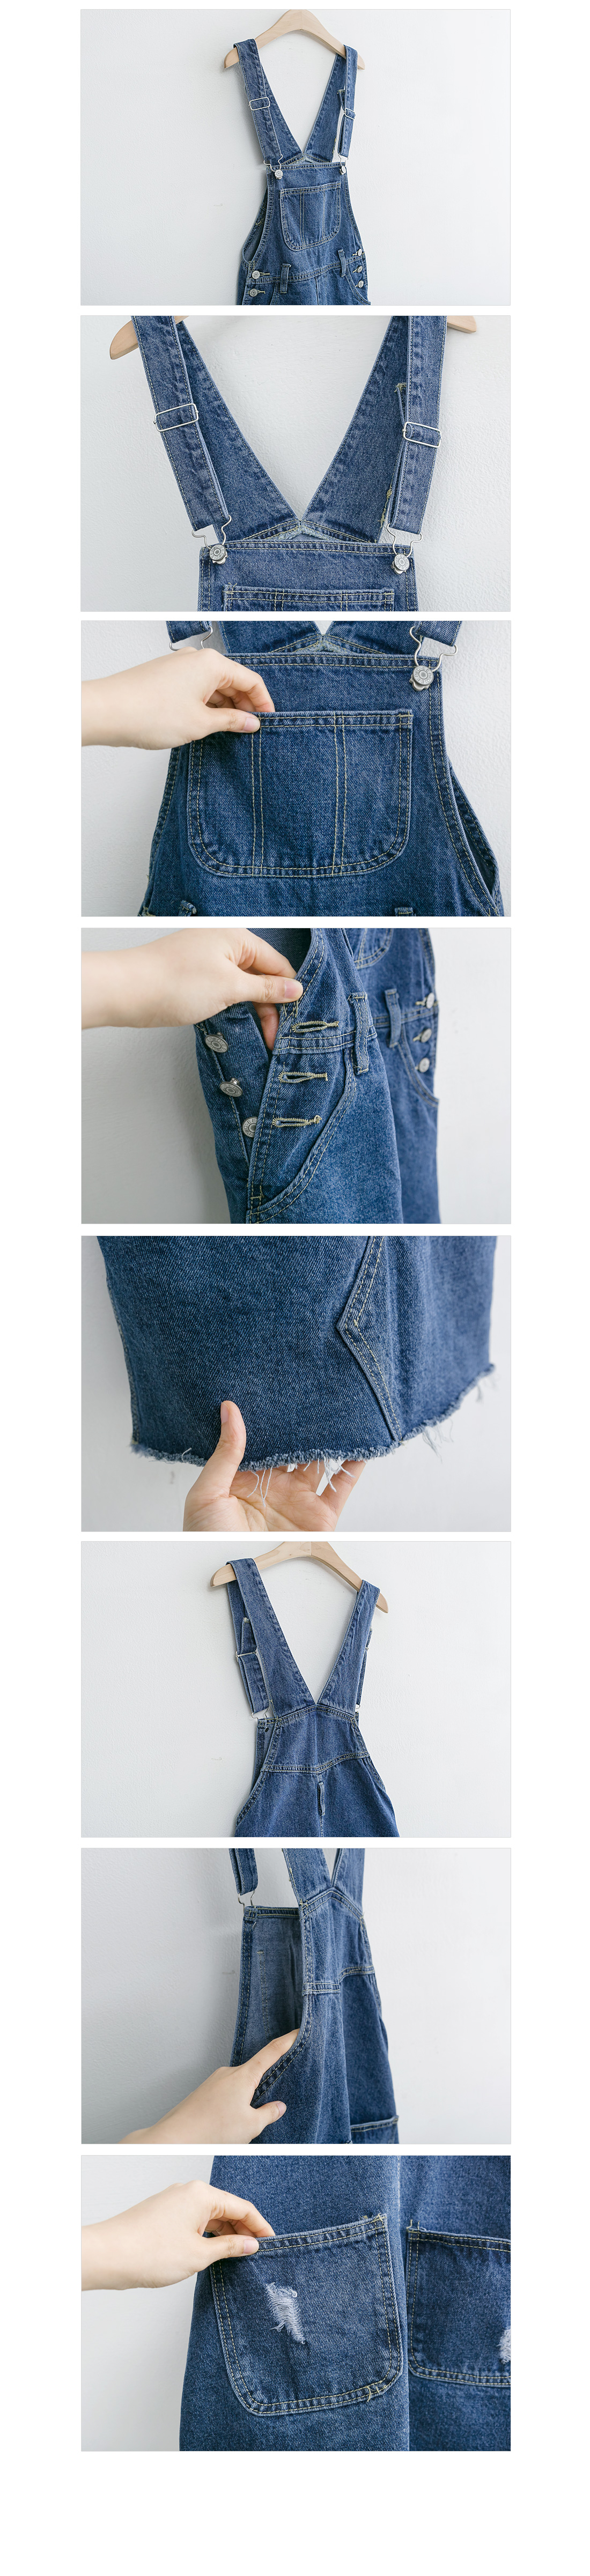 Denim Suspender Skirt #73754 Real Blue L Available